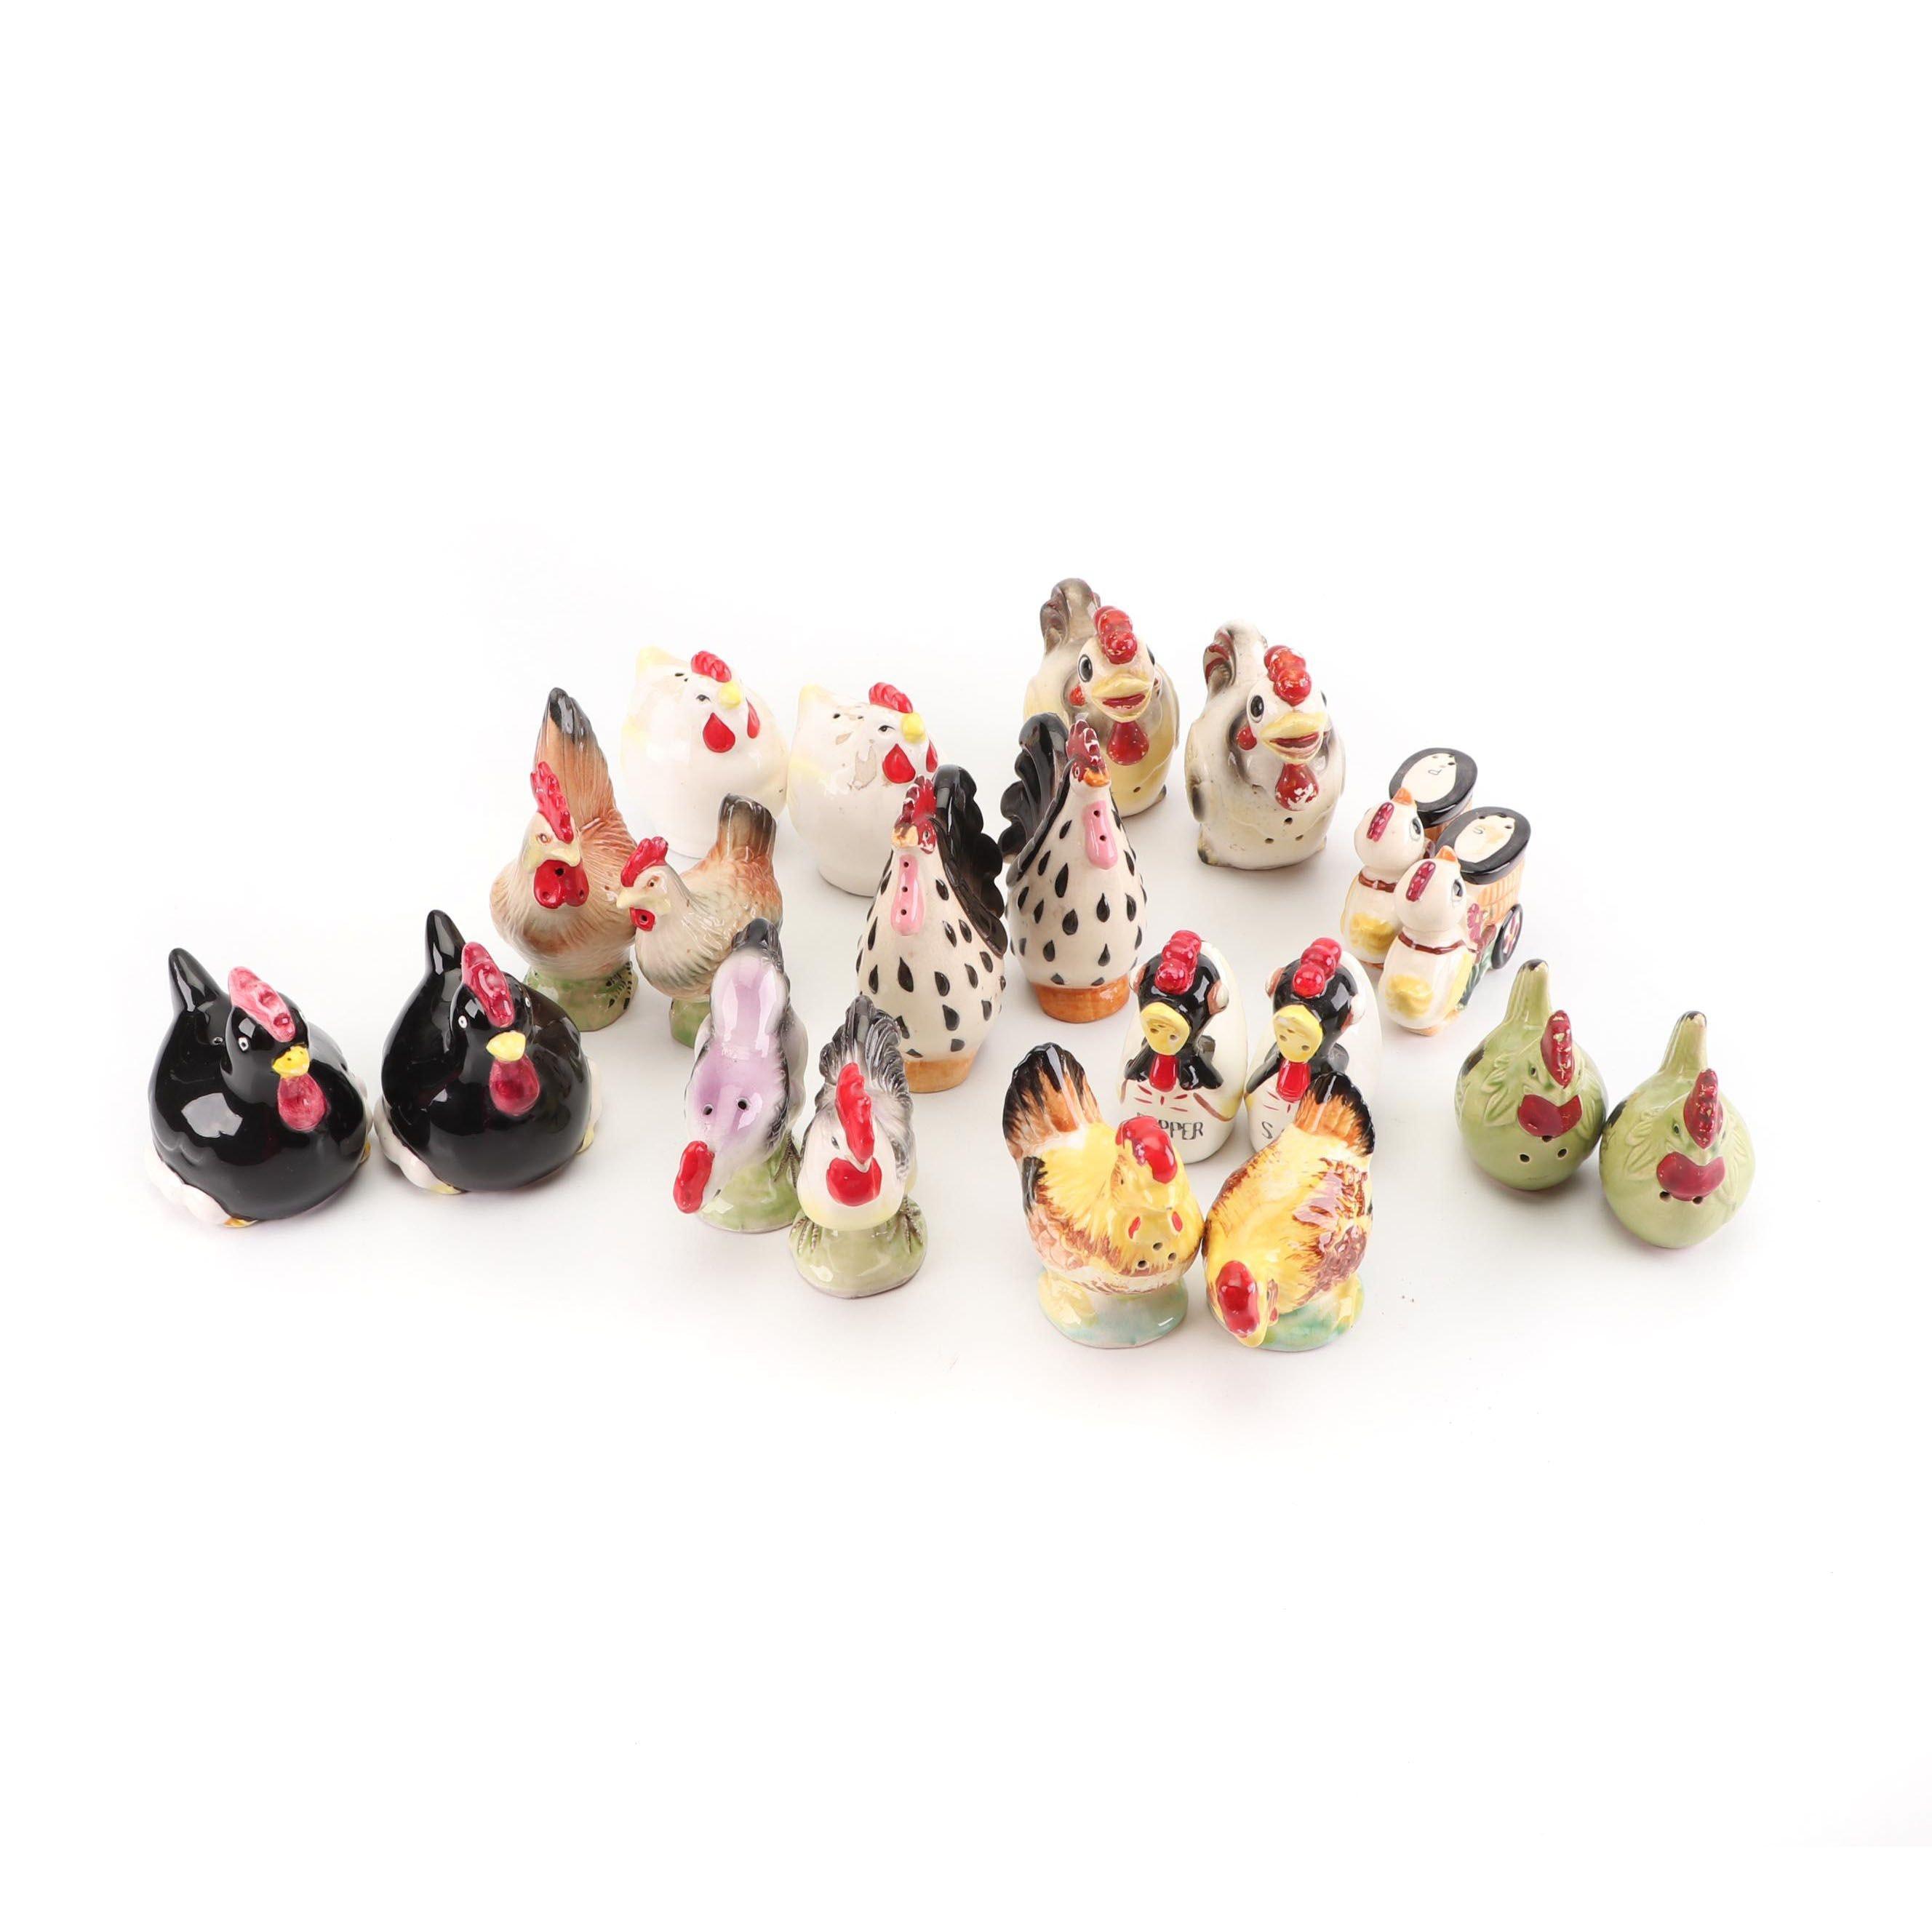 Figural Chicken Ceramic Salt and Pepper Shakers, Vintage